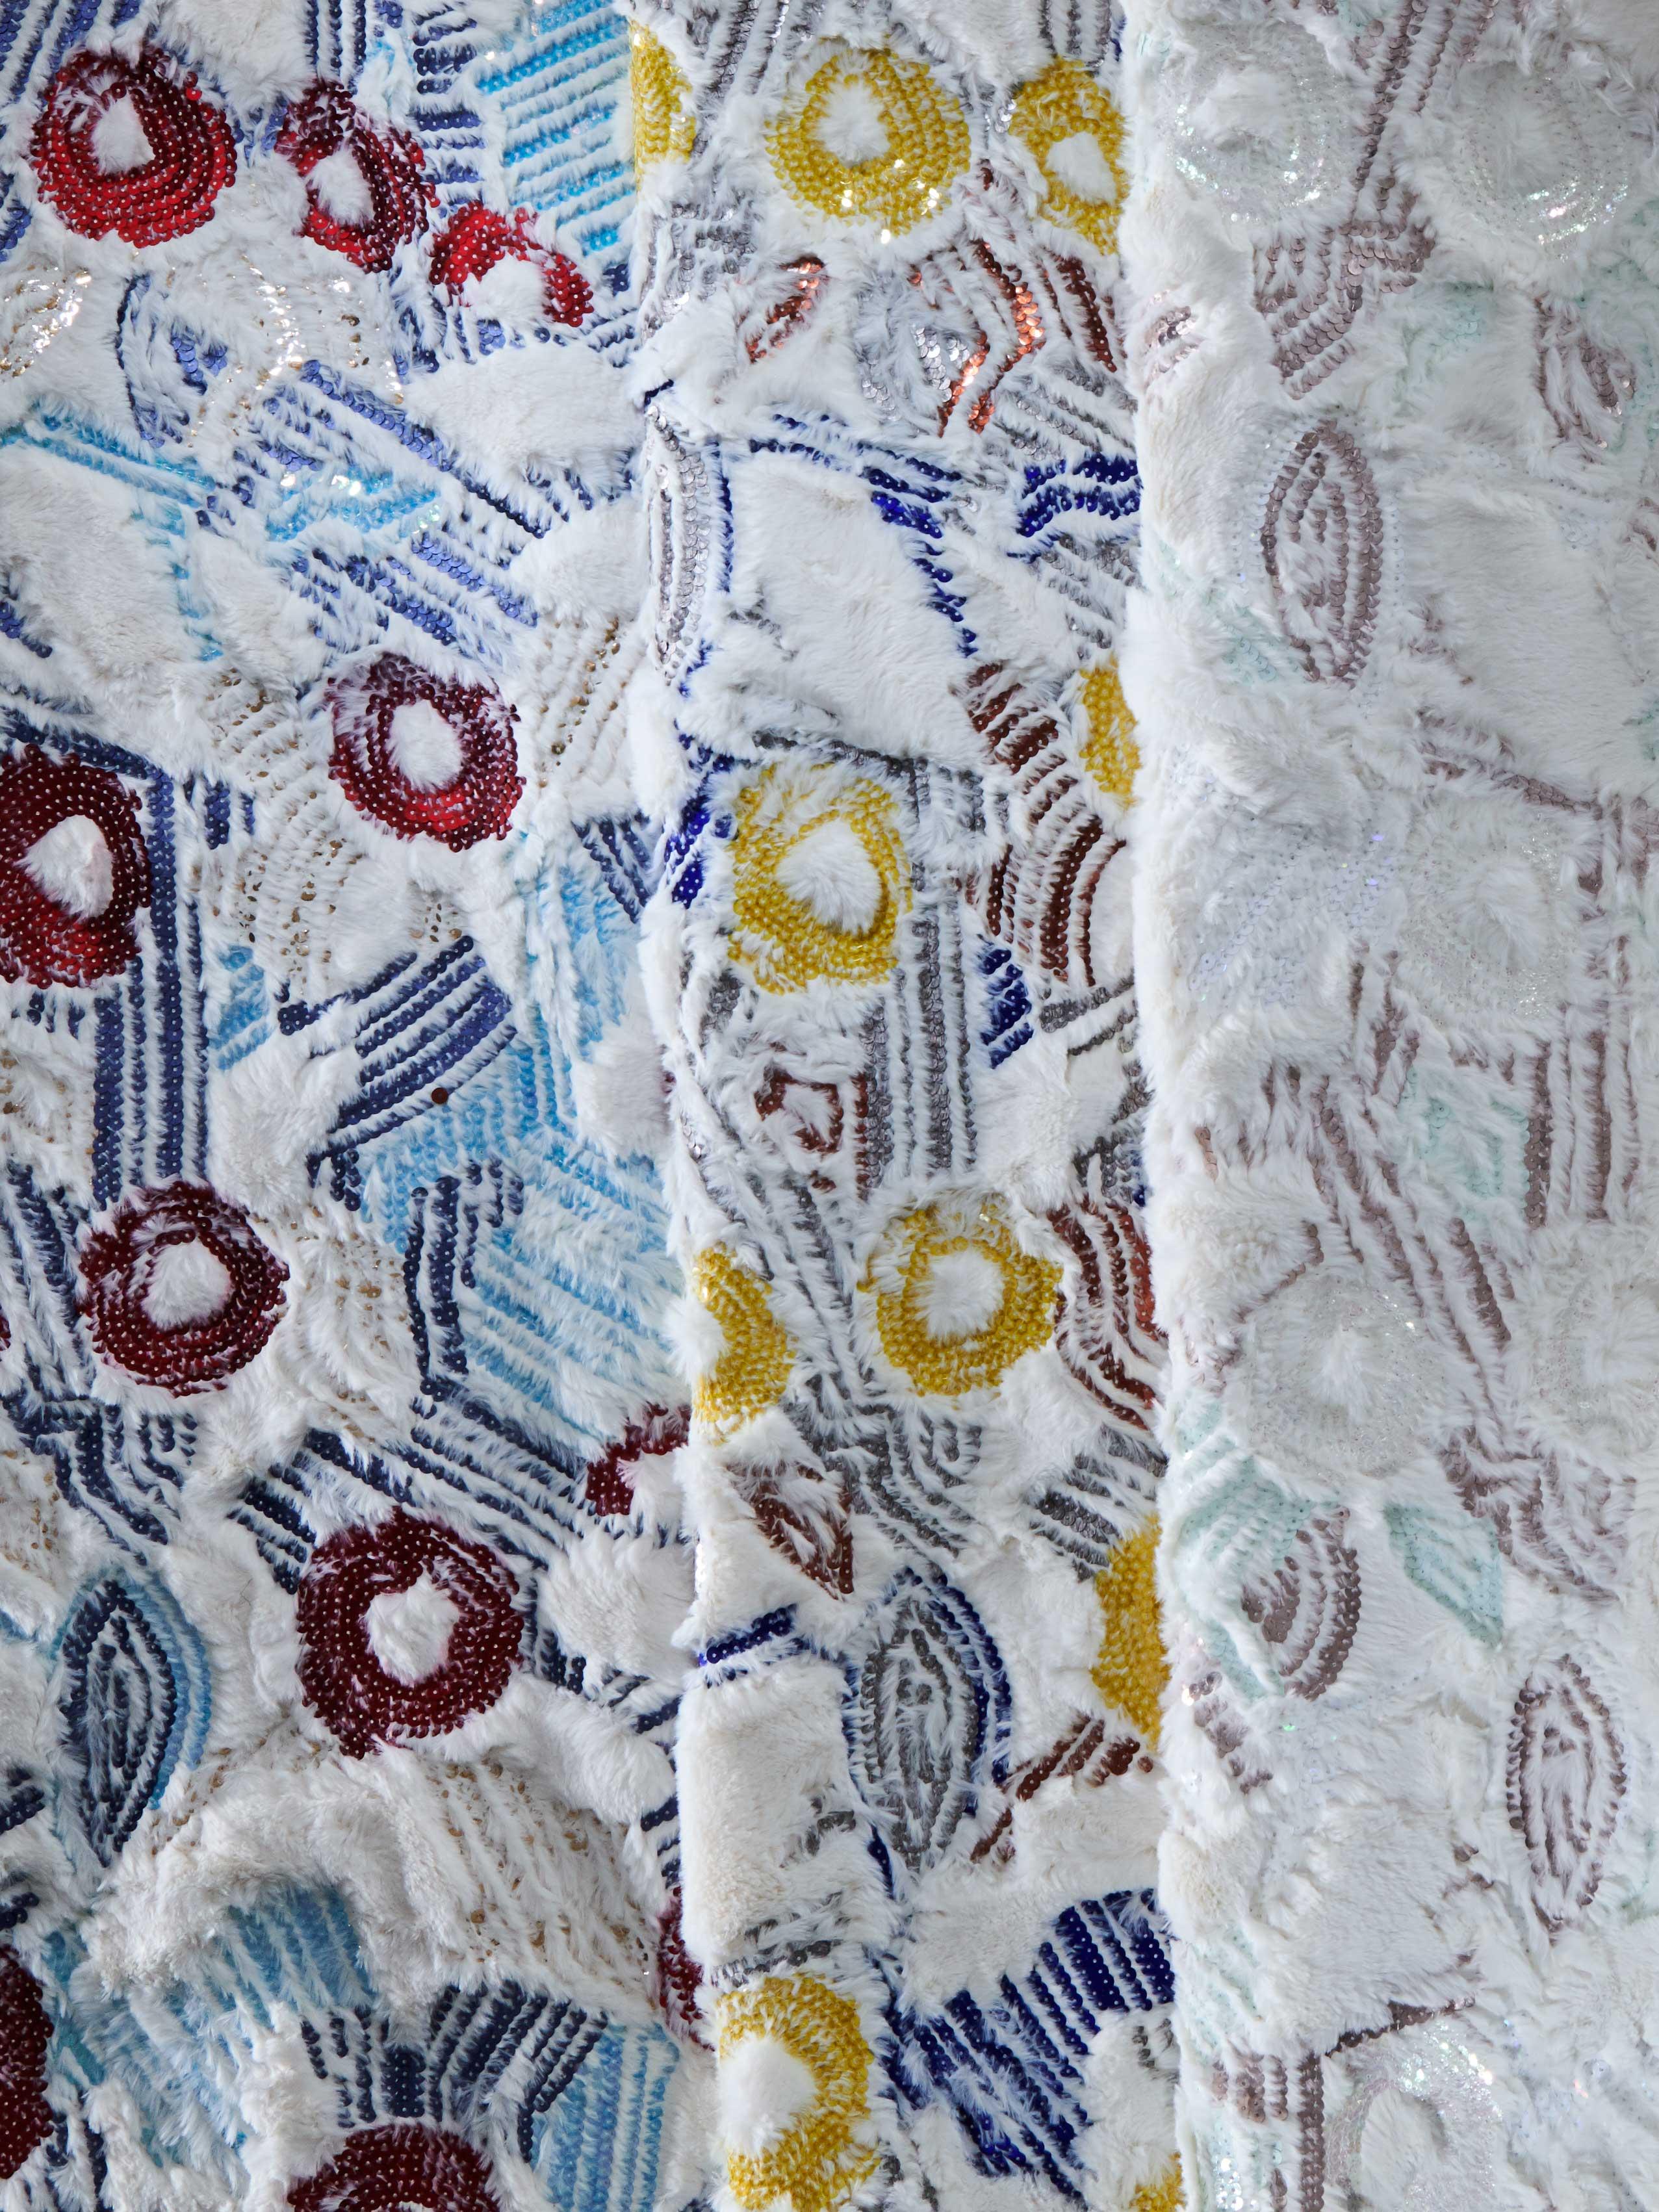 bernhard duss-jakob schlaepfer-textiledesign-tapeten-designer-custom made wallcovering-interiorfabrics-interior collection-embroidery-sequins